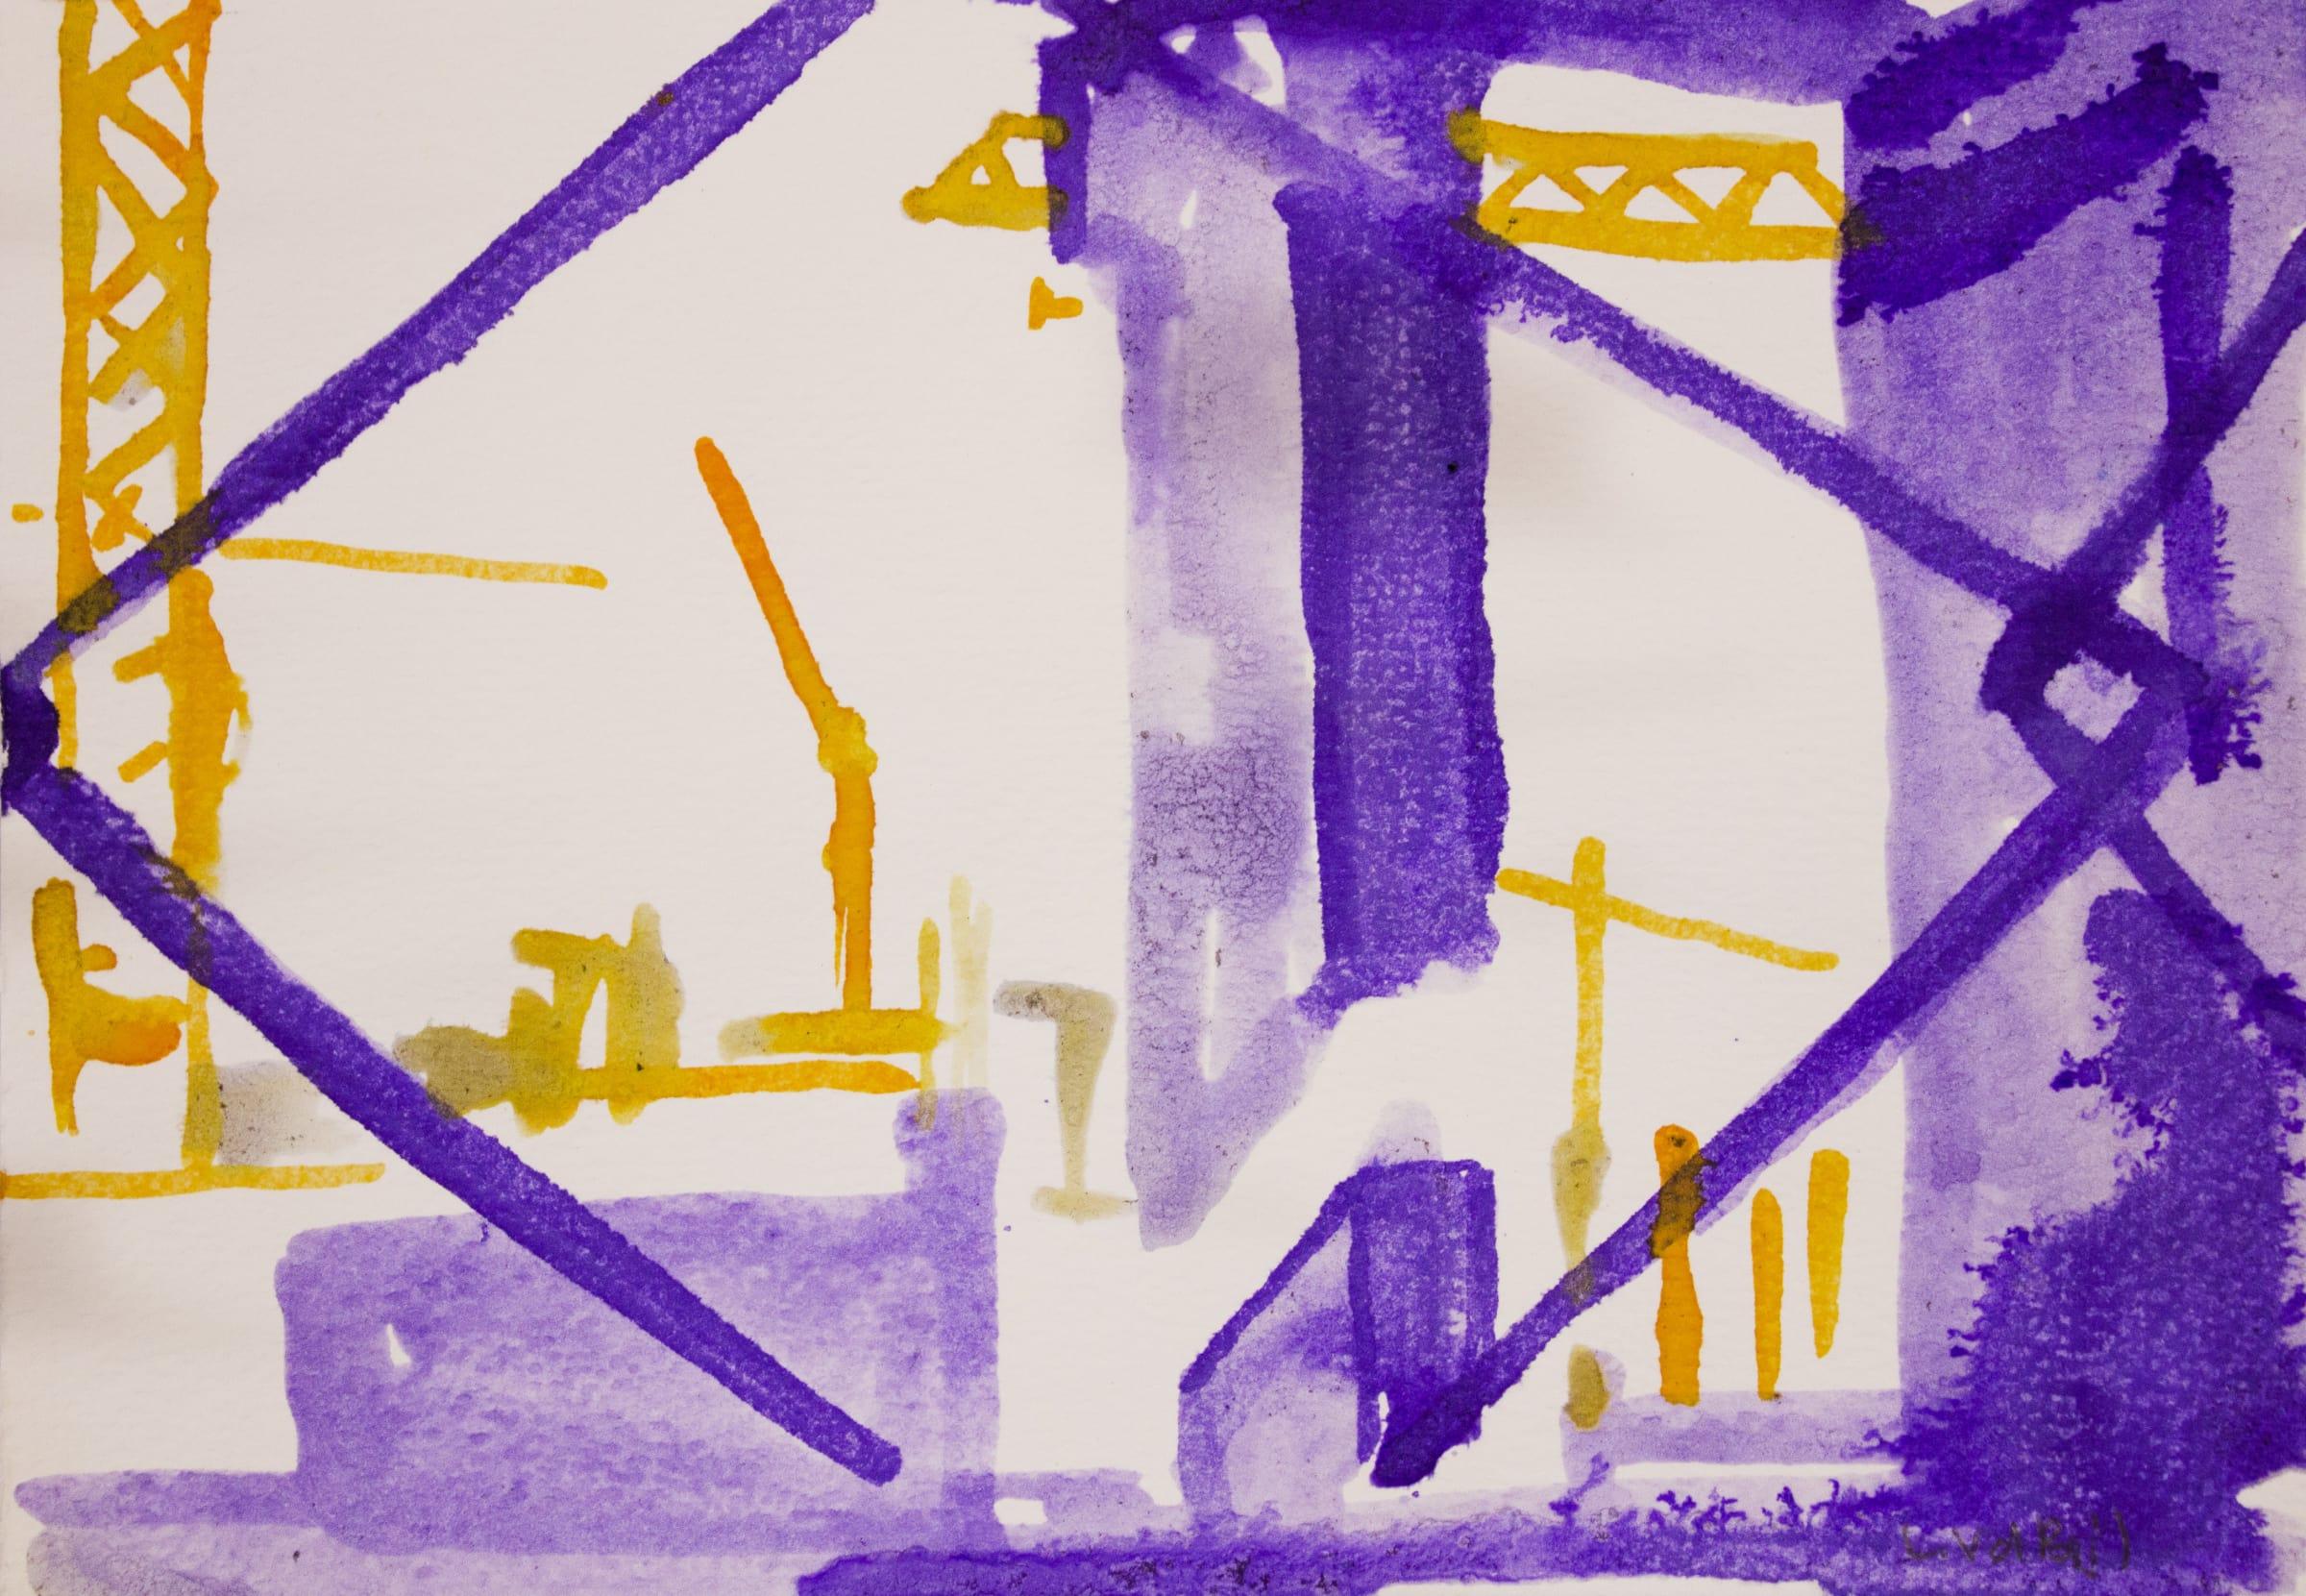 <span class=&#34;link fancybox-details-link&#34;><a href=&#34;/artists/88-louise-van-der-bijl/works/2274-louise-van-der-bijl-inktober-day-12-2018/&#34;>View Detail Page</a></span><div class=&#34;artist&#34;><strong>Louise Van Der Bijl</strong></div> <div class=&#34;title&#34;><em>Inktober Day 12</em>, 2018</div> <div class=&#34;medium&#34;>Ink On Paper</div> <div class=&#34;dimensions&#34;>14.9cm x 21cm</div><div class=&#34;price&#34;>R400.00</div>